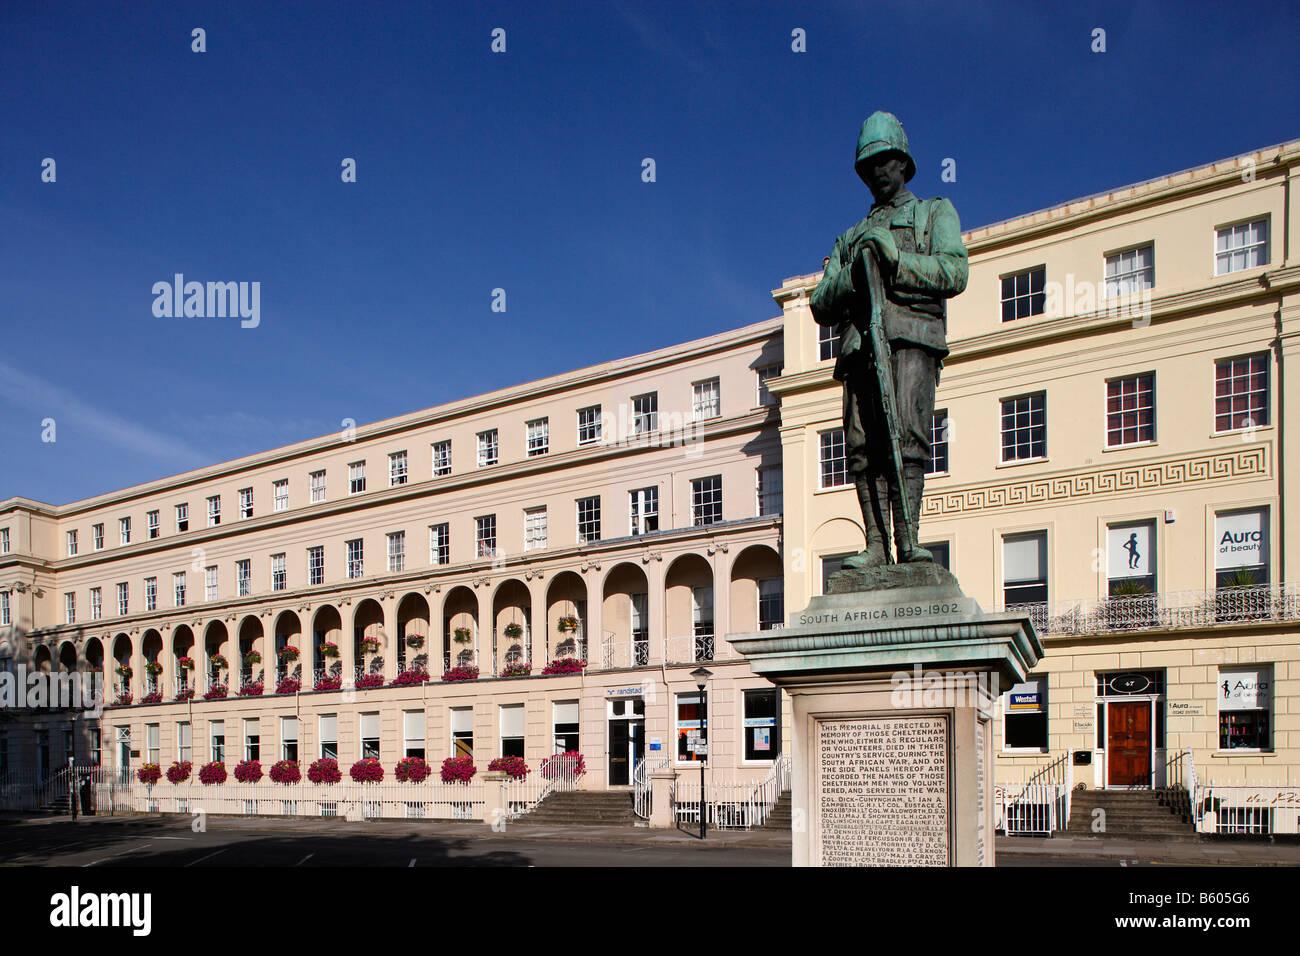 Cheltenham Regency Terraces Municipal Offices Memorial of South Africa s War 1899 1902 Gloucestershire UK - Stock Image